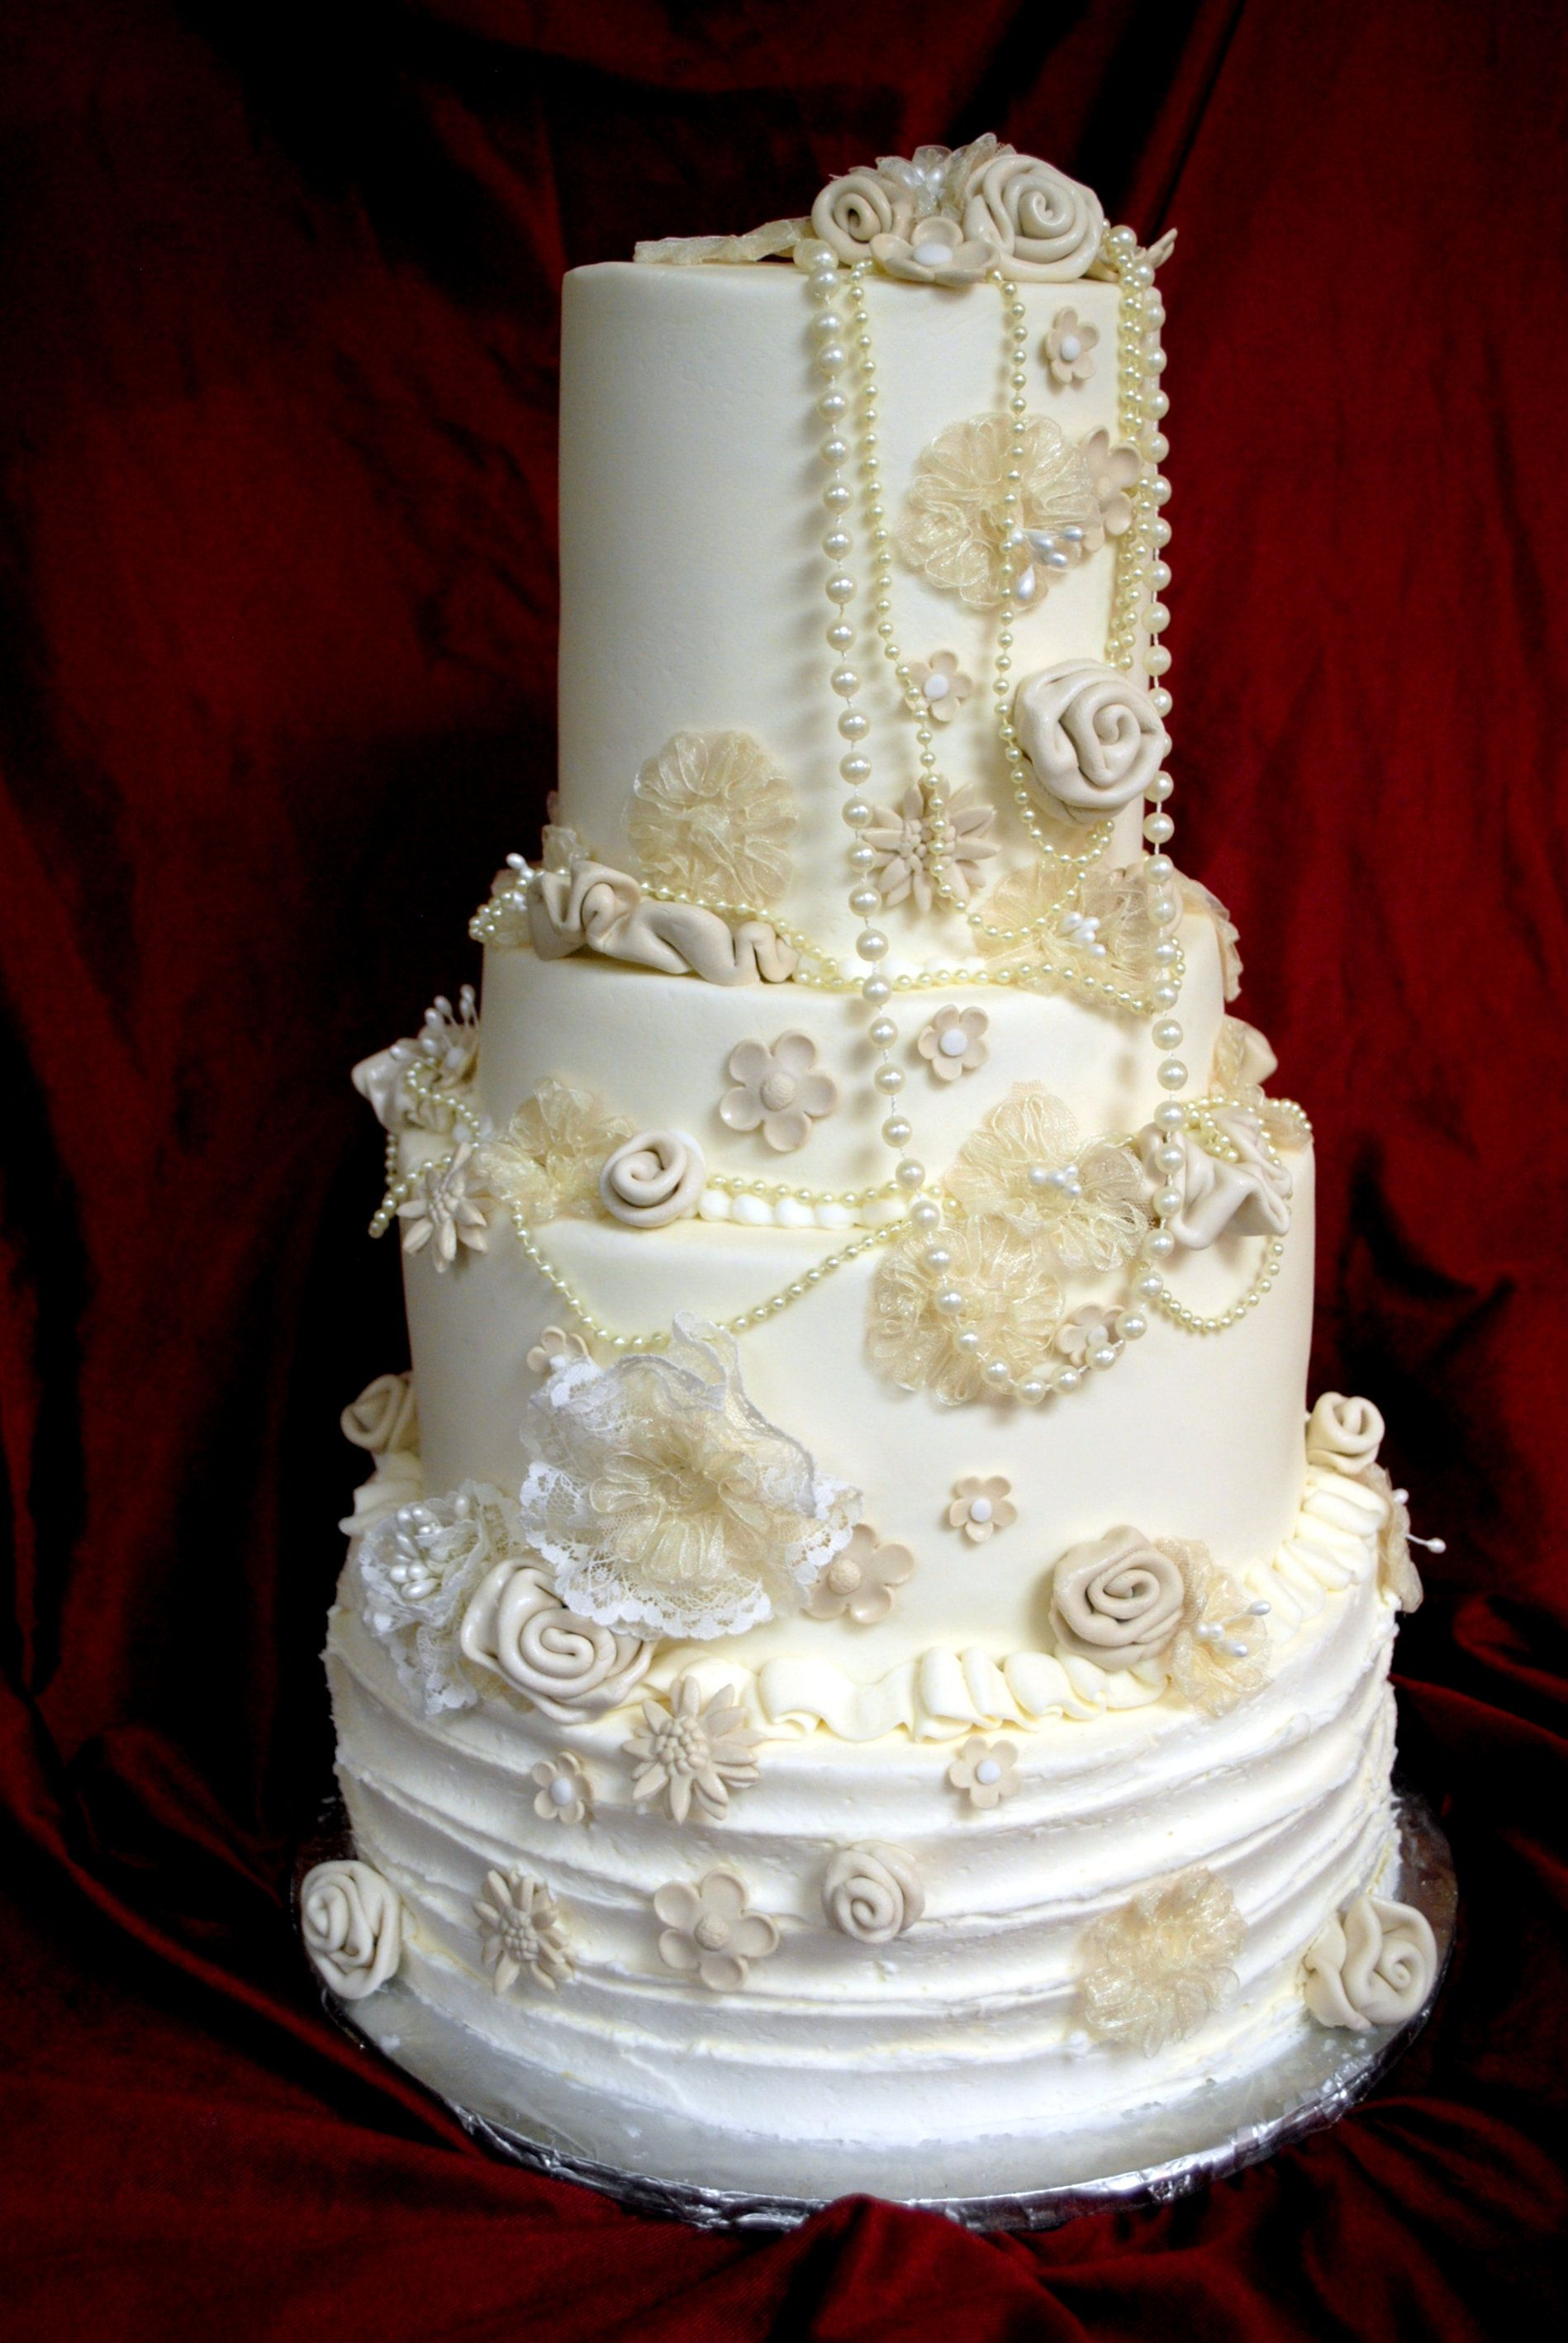 vintage wedding cake custom cakes pinterest. Black Bedroom Furniture Sets. Home Design Ideas